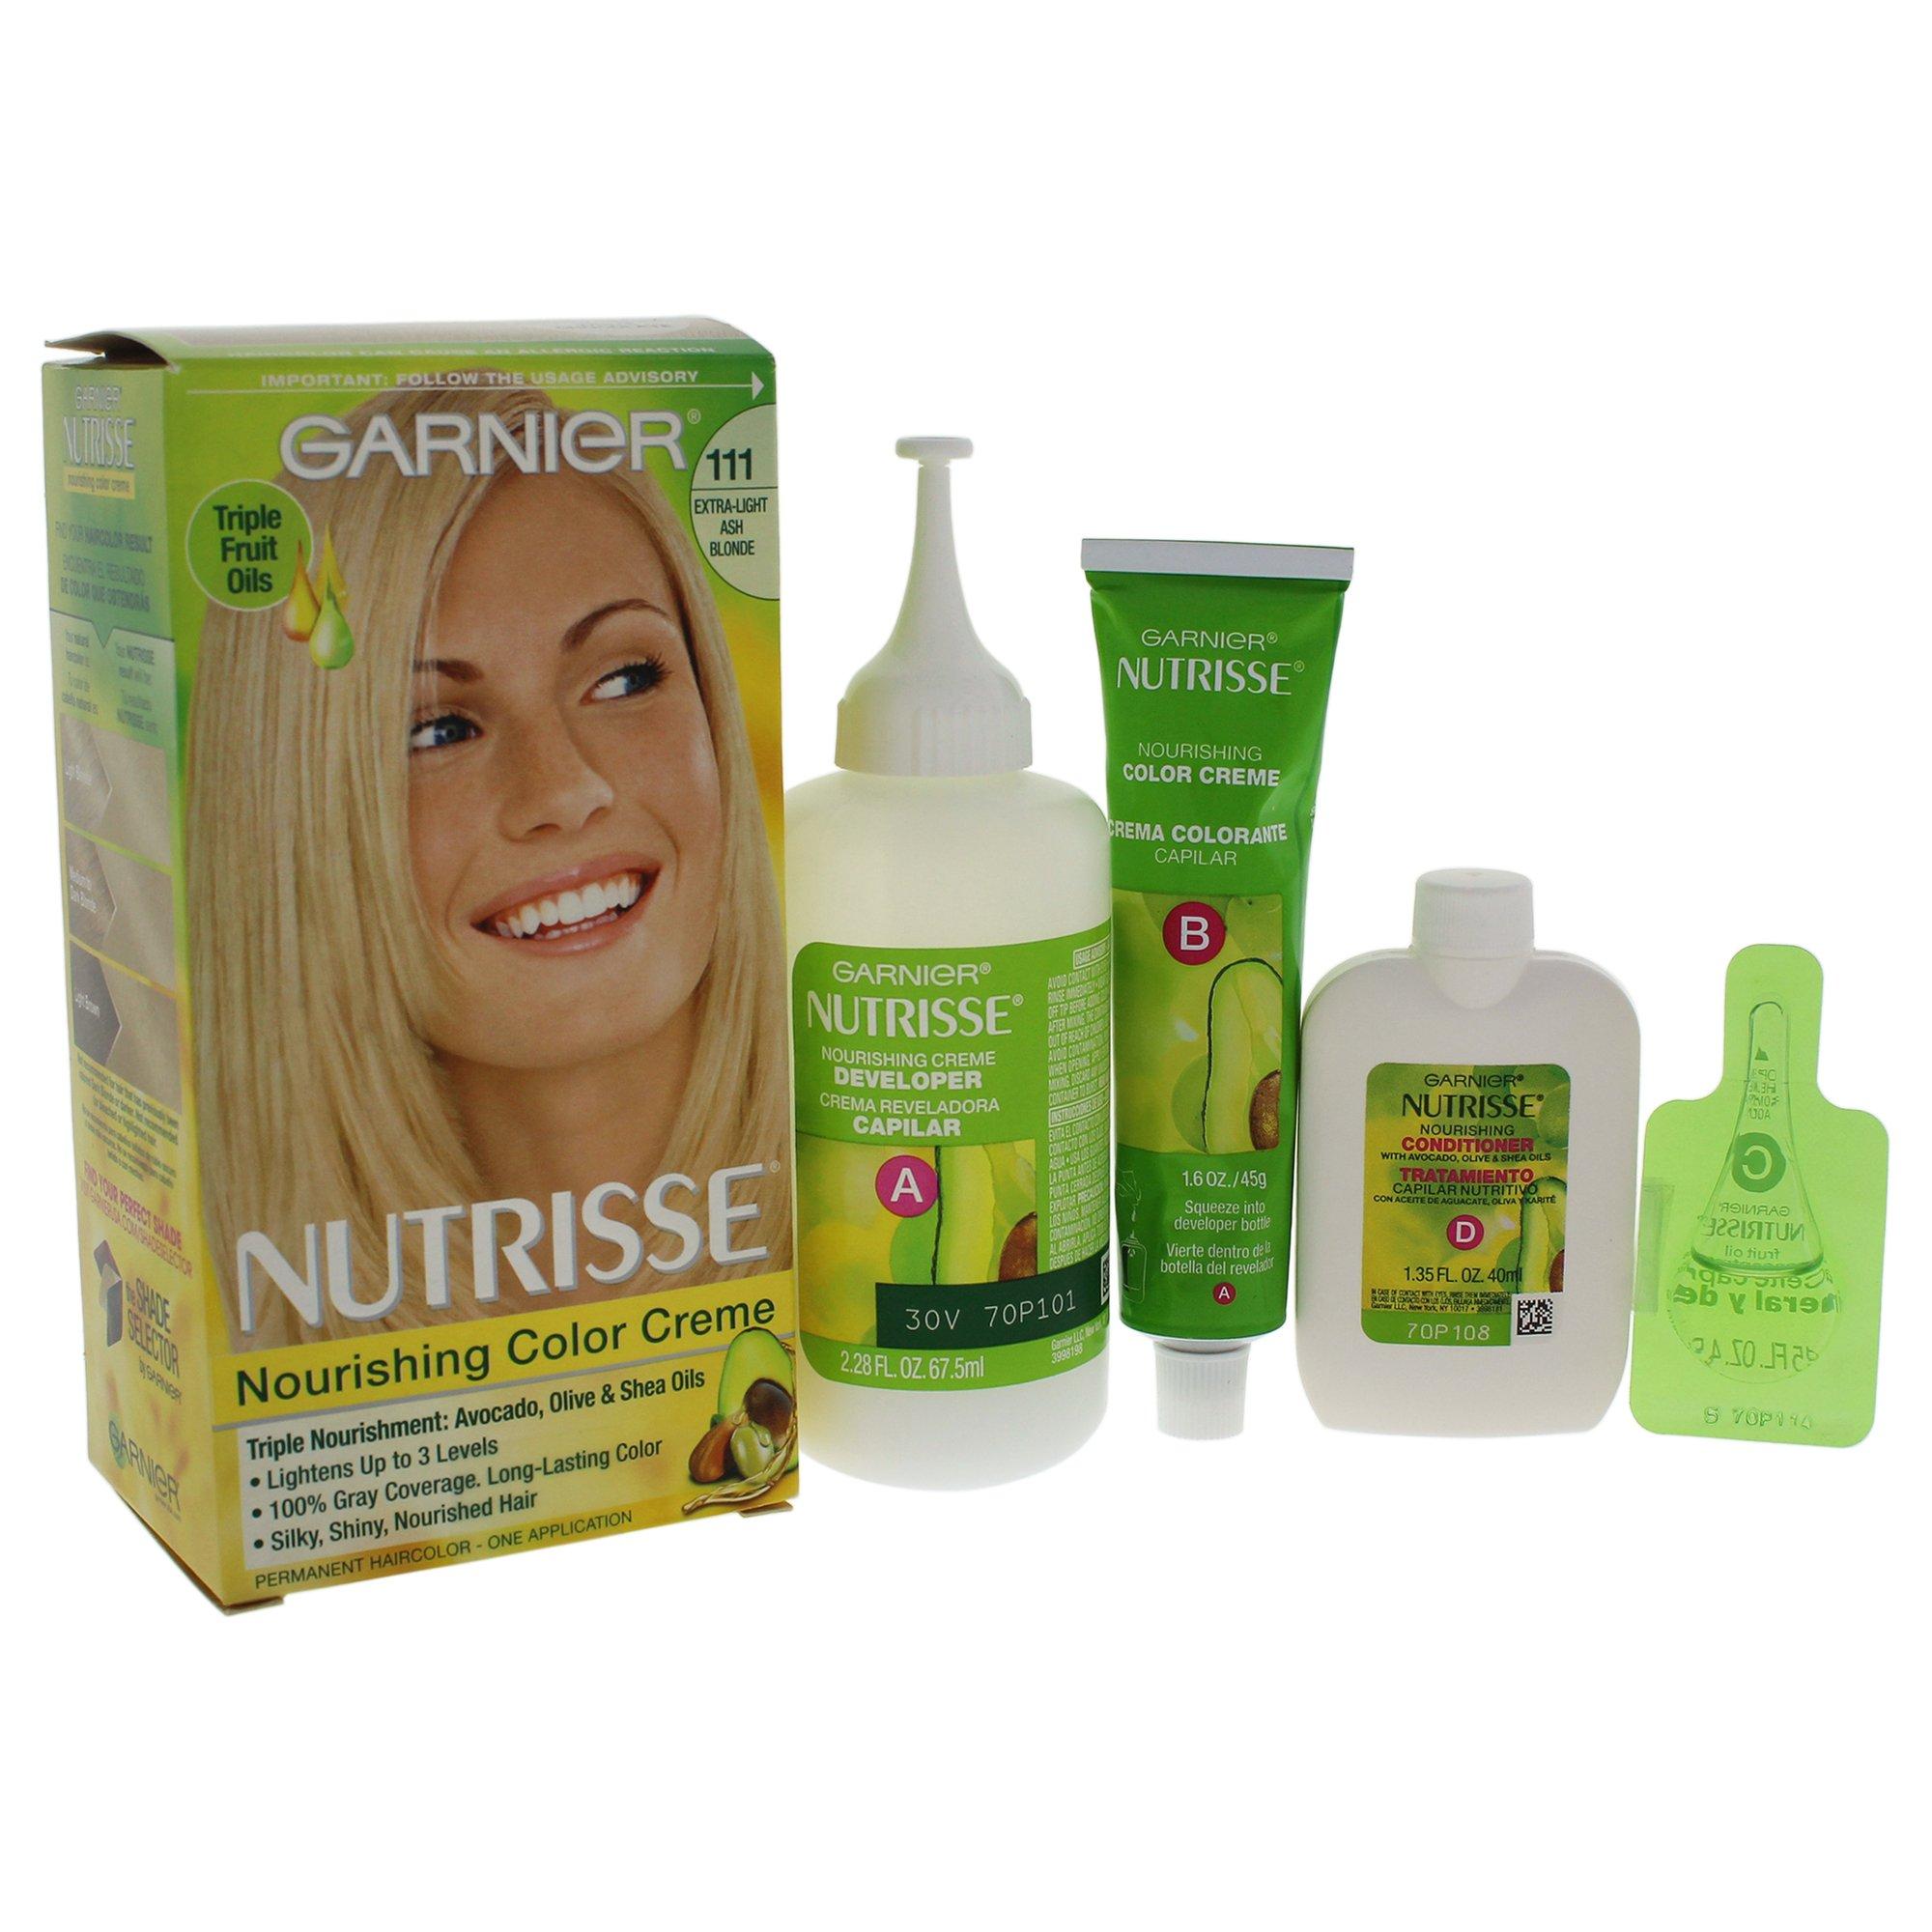 Amazon.com : Garnier Nutrisse Level 3 Permanent Hair Creme, Extra ...